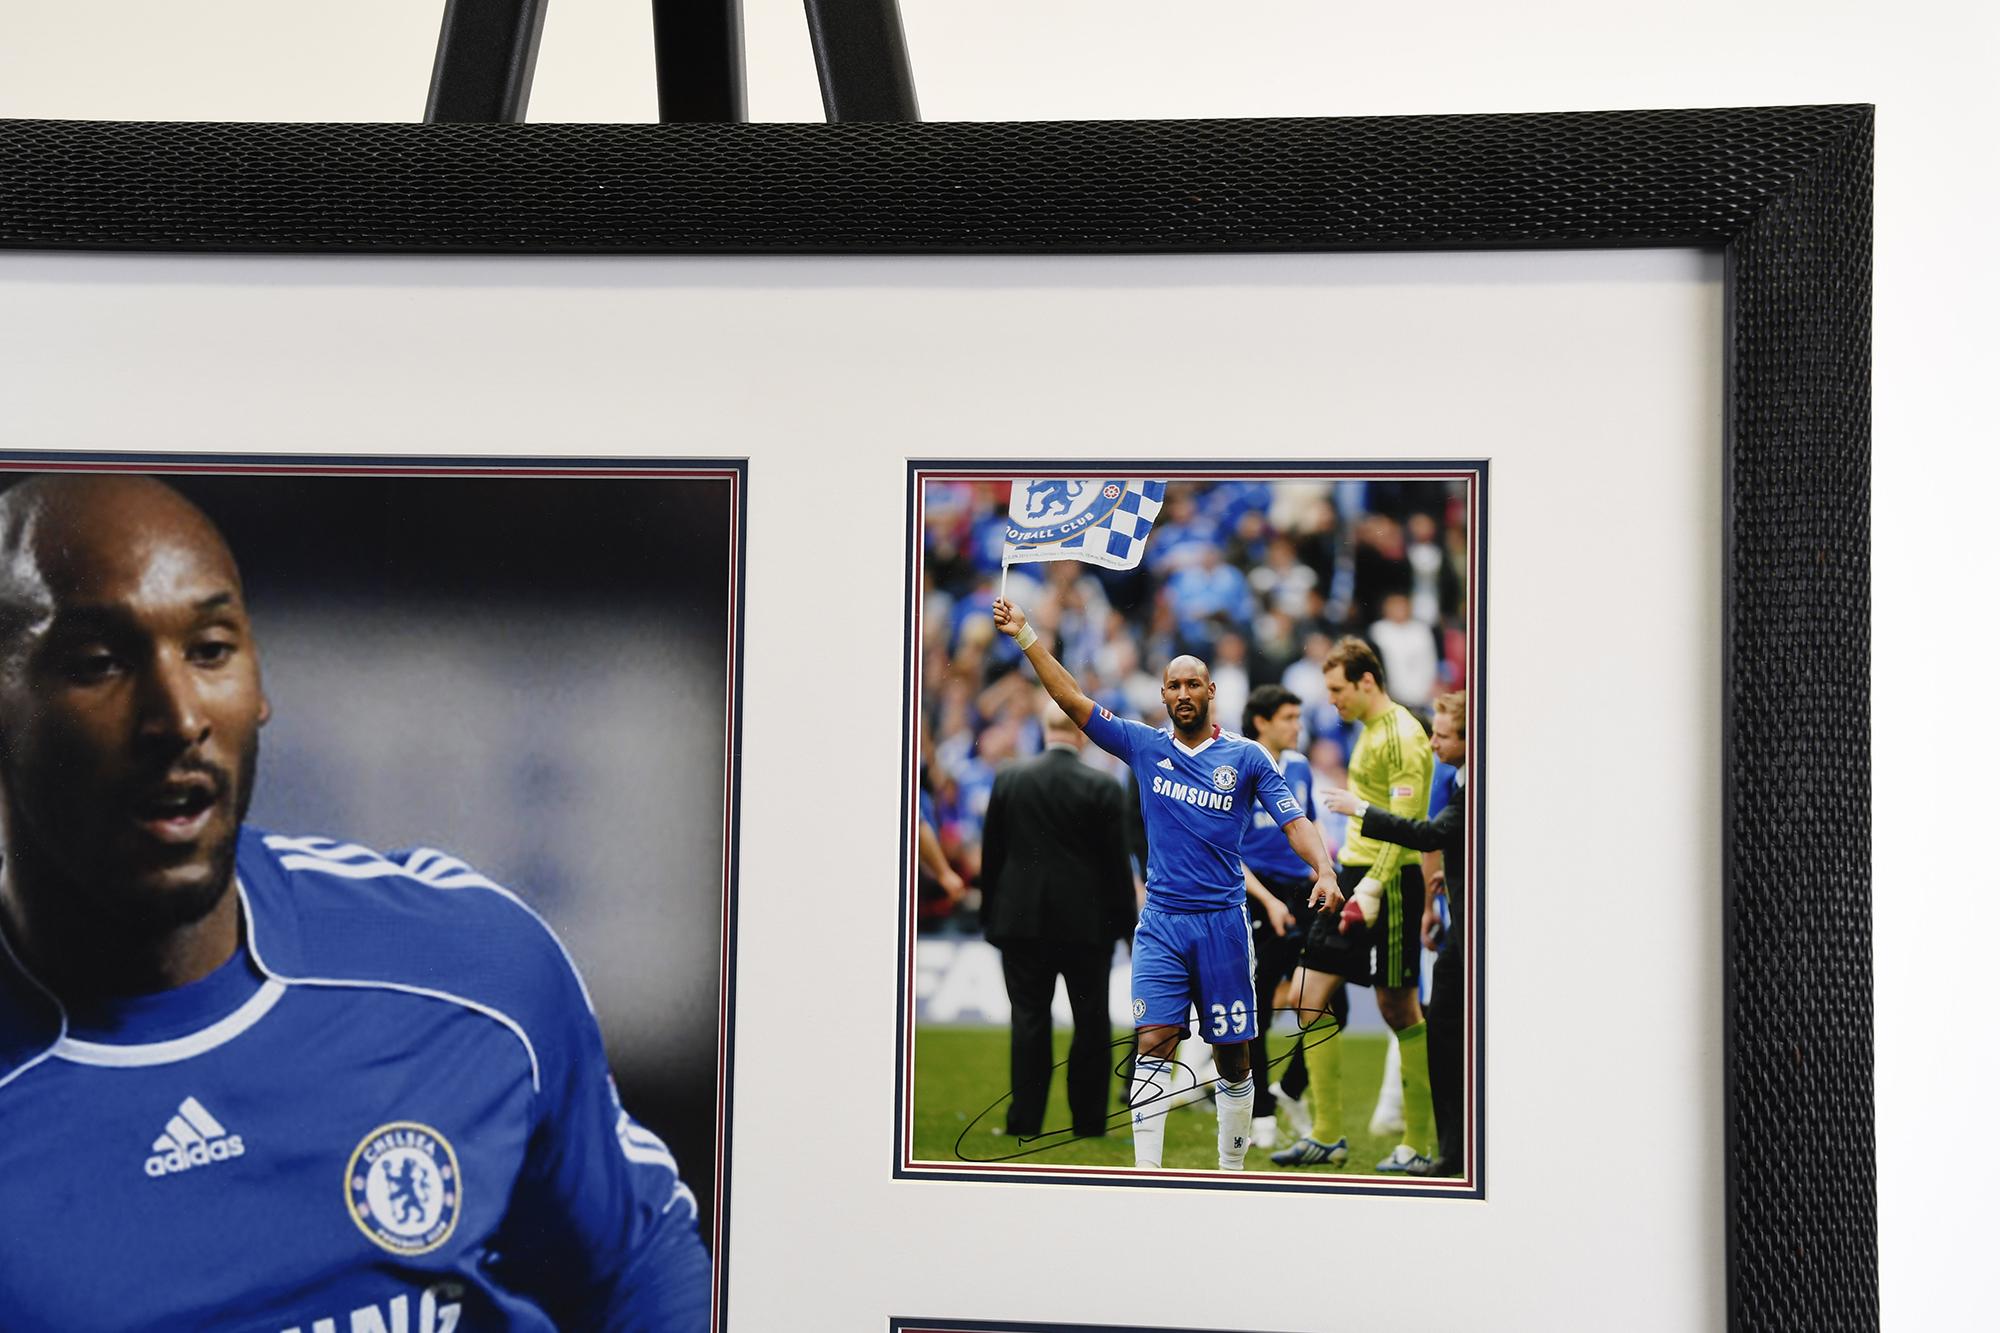 Framed Presentation of Chelsea Footballer Nicolas Anelka. - Image 2 of 4